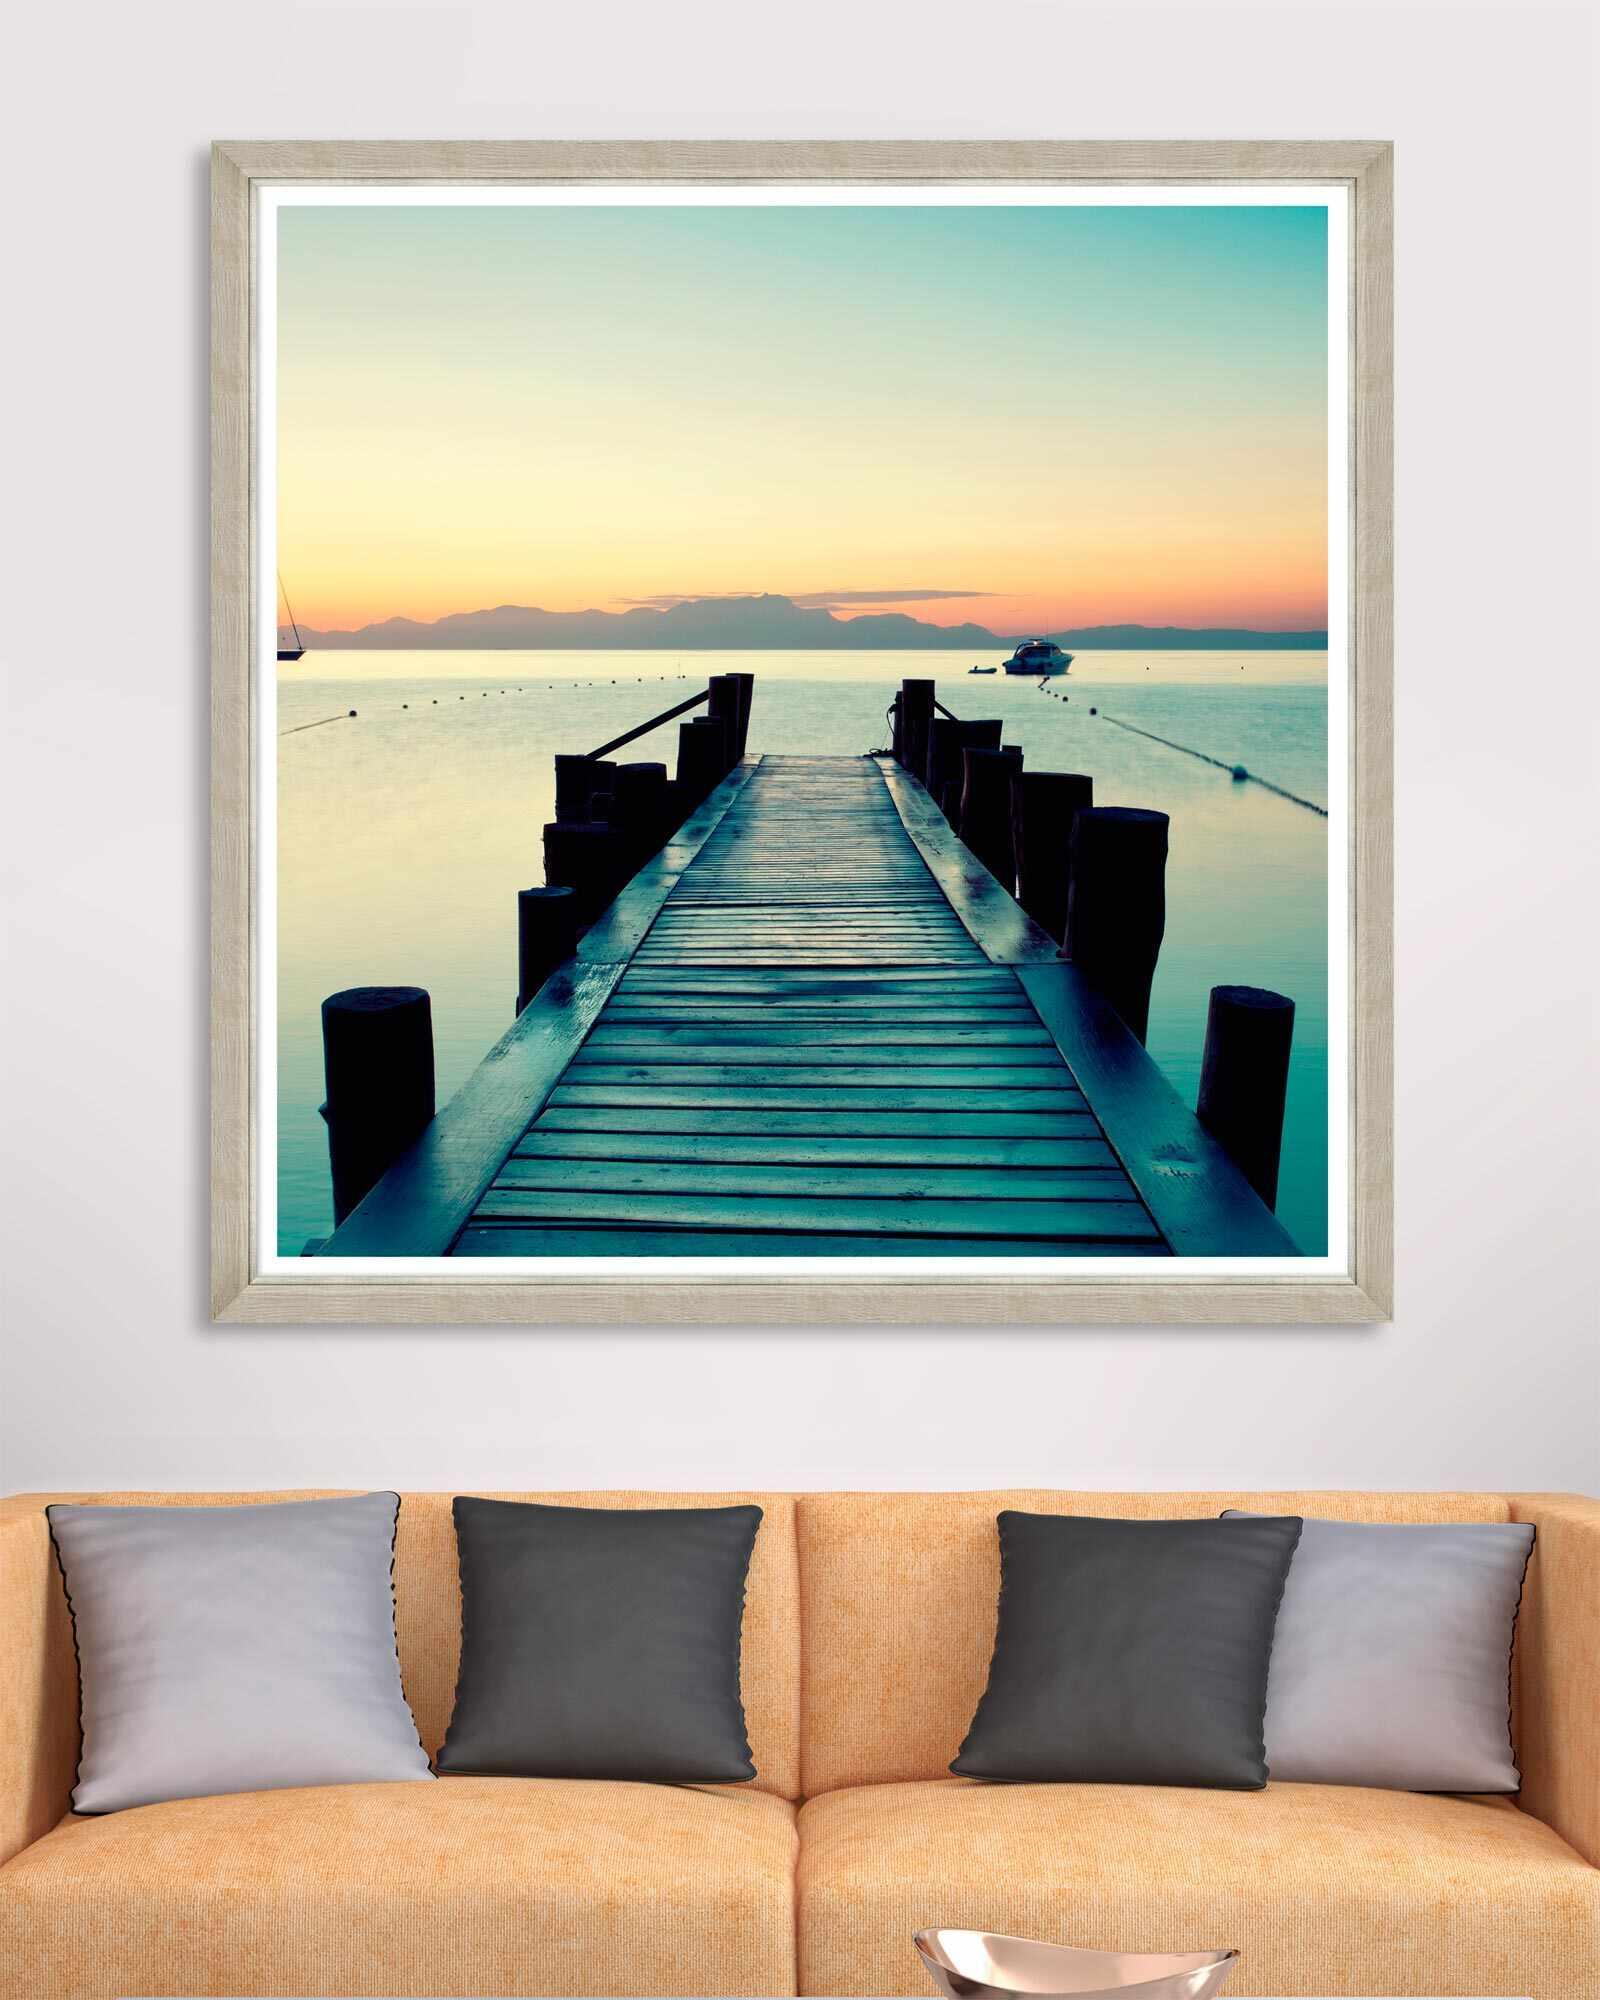 Tablou Framed Art Sunset Pier la pret 911 lei